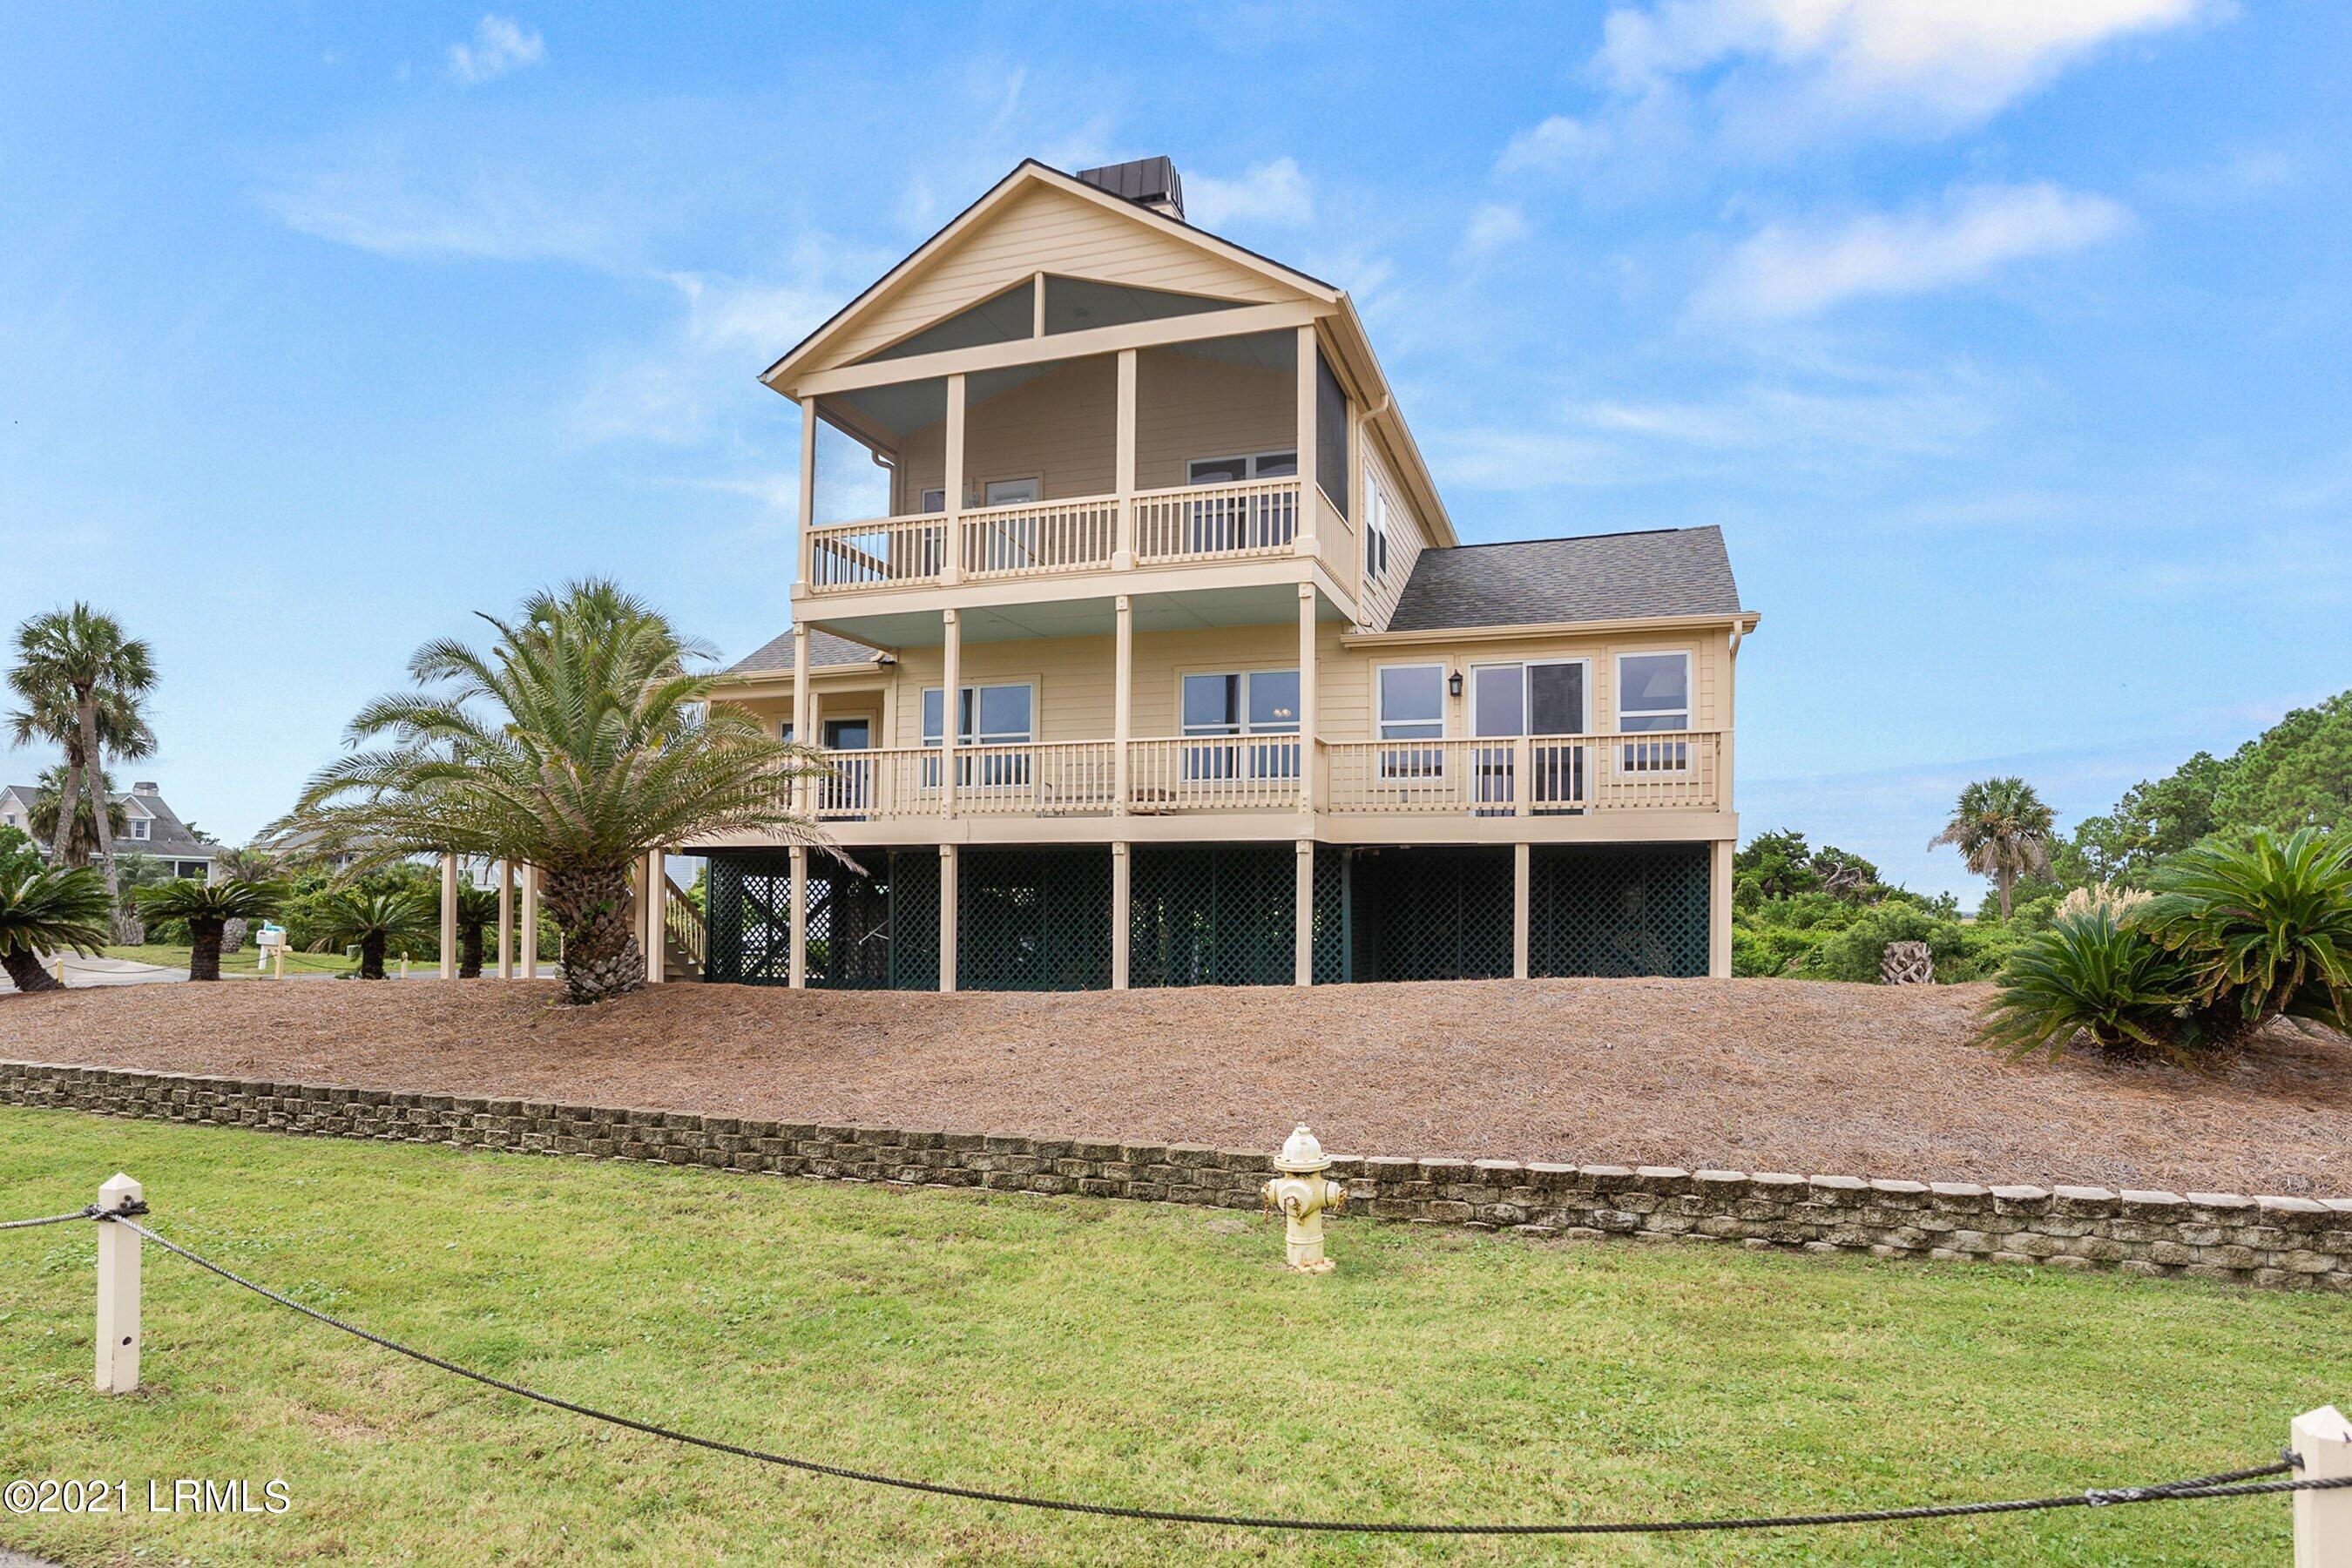 Photo of 2 Ebbtide Court, Harbor Island, SC 29920